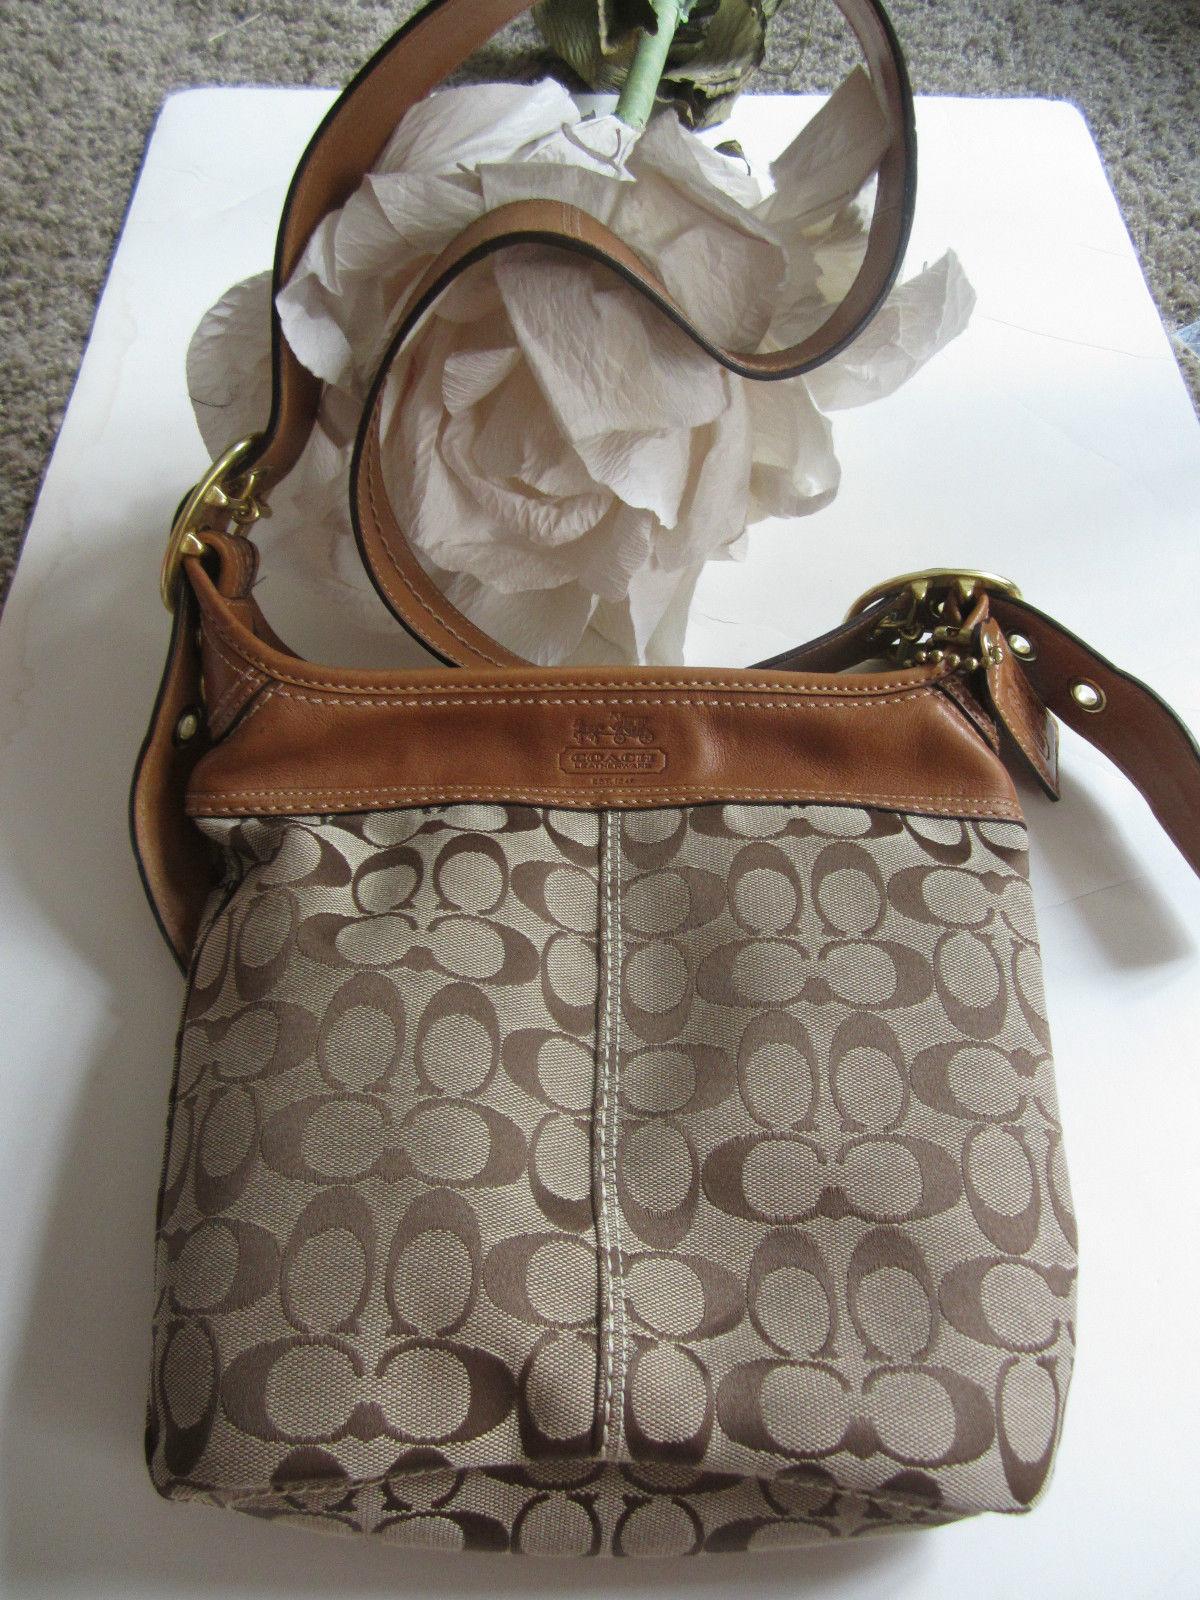 NEW Authentic Coach Designer signature C Vachetta Tan Leather Buckled Saddle Handbag/purse~ Retails $249 (20203165 FURBUYSPLUS TOO!!) photo